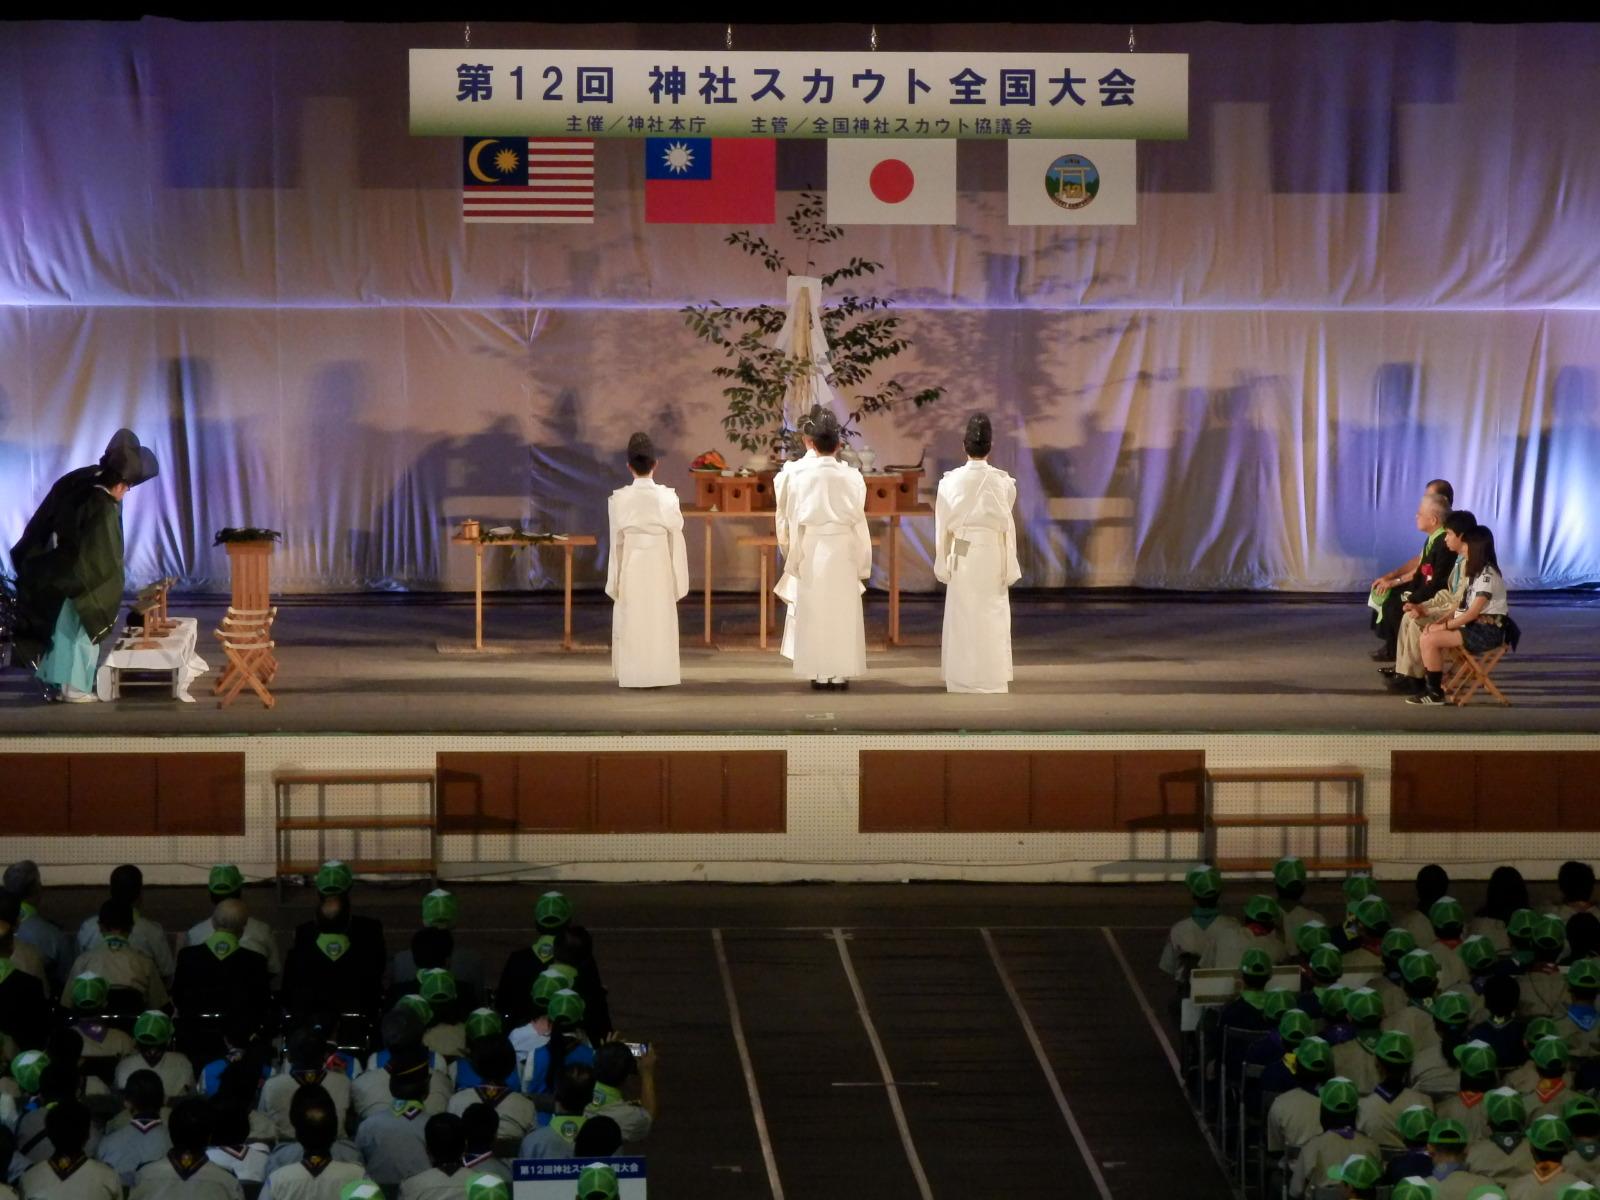 神社スカウト全国大会 開催奉告祭奉仕